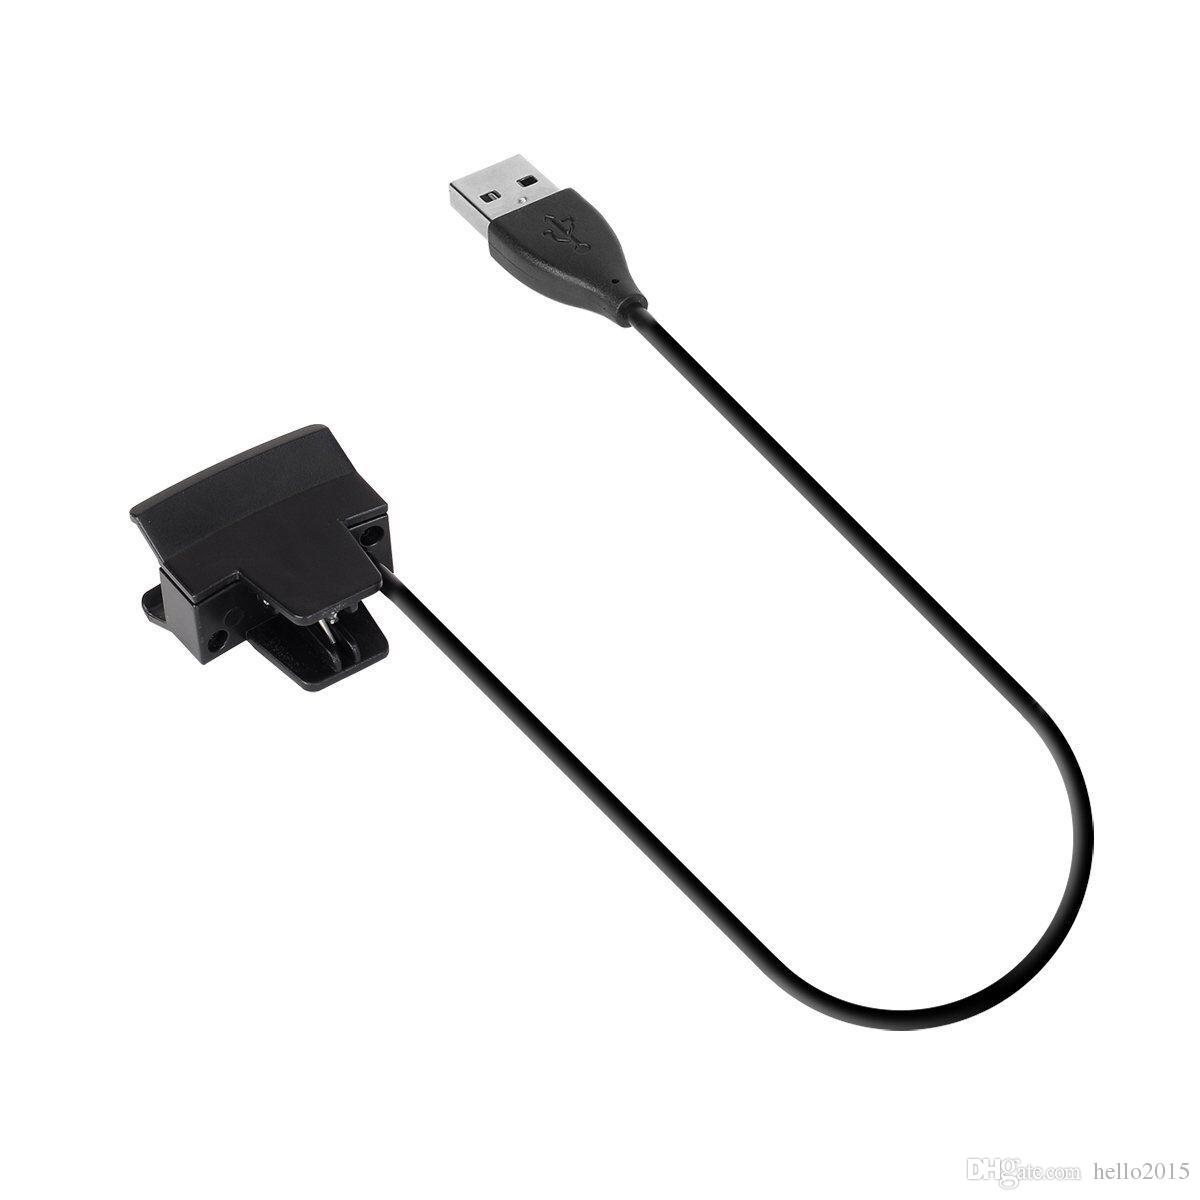 Alta calidad Nuevo OEM Cargadores USB Cables de cable de carga Reemplazo para Fitbit Alta Wireless Wristband Clamp Clip Cable